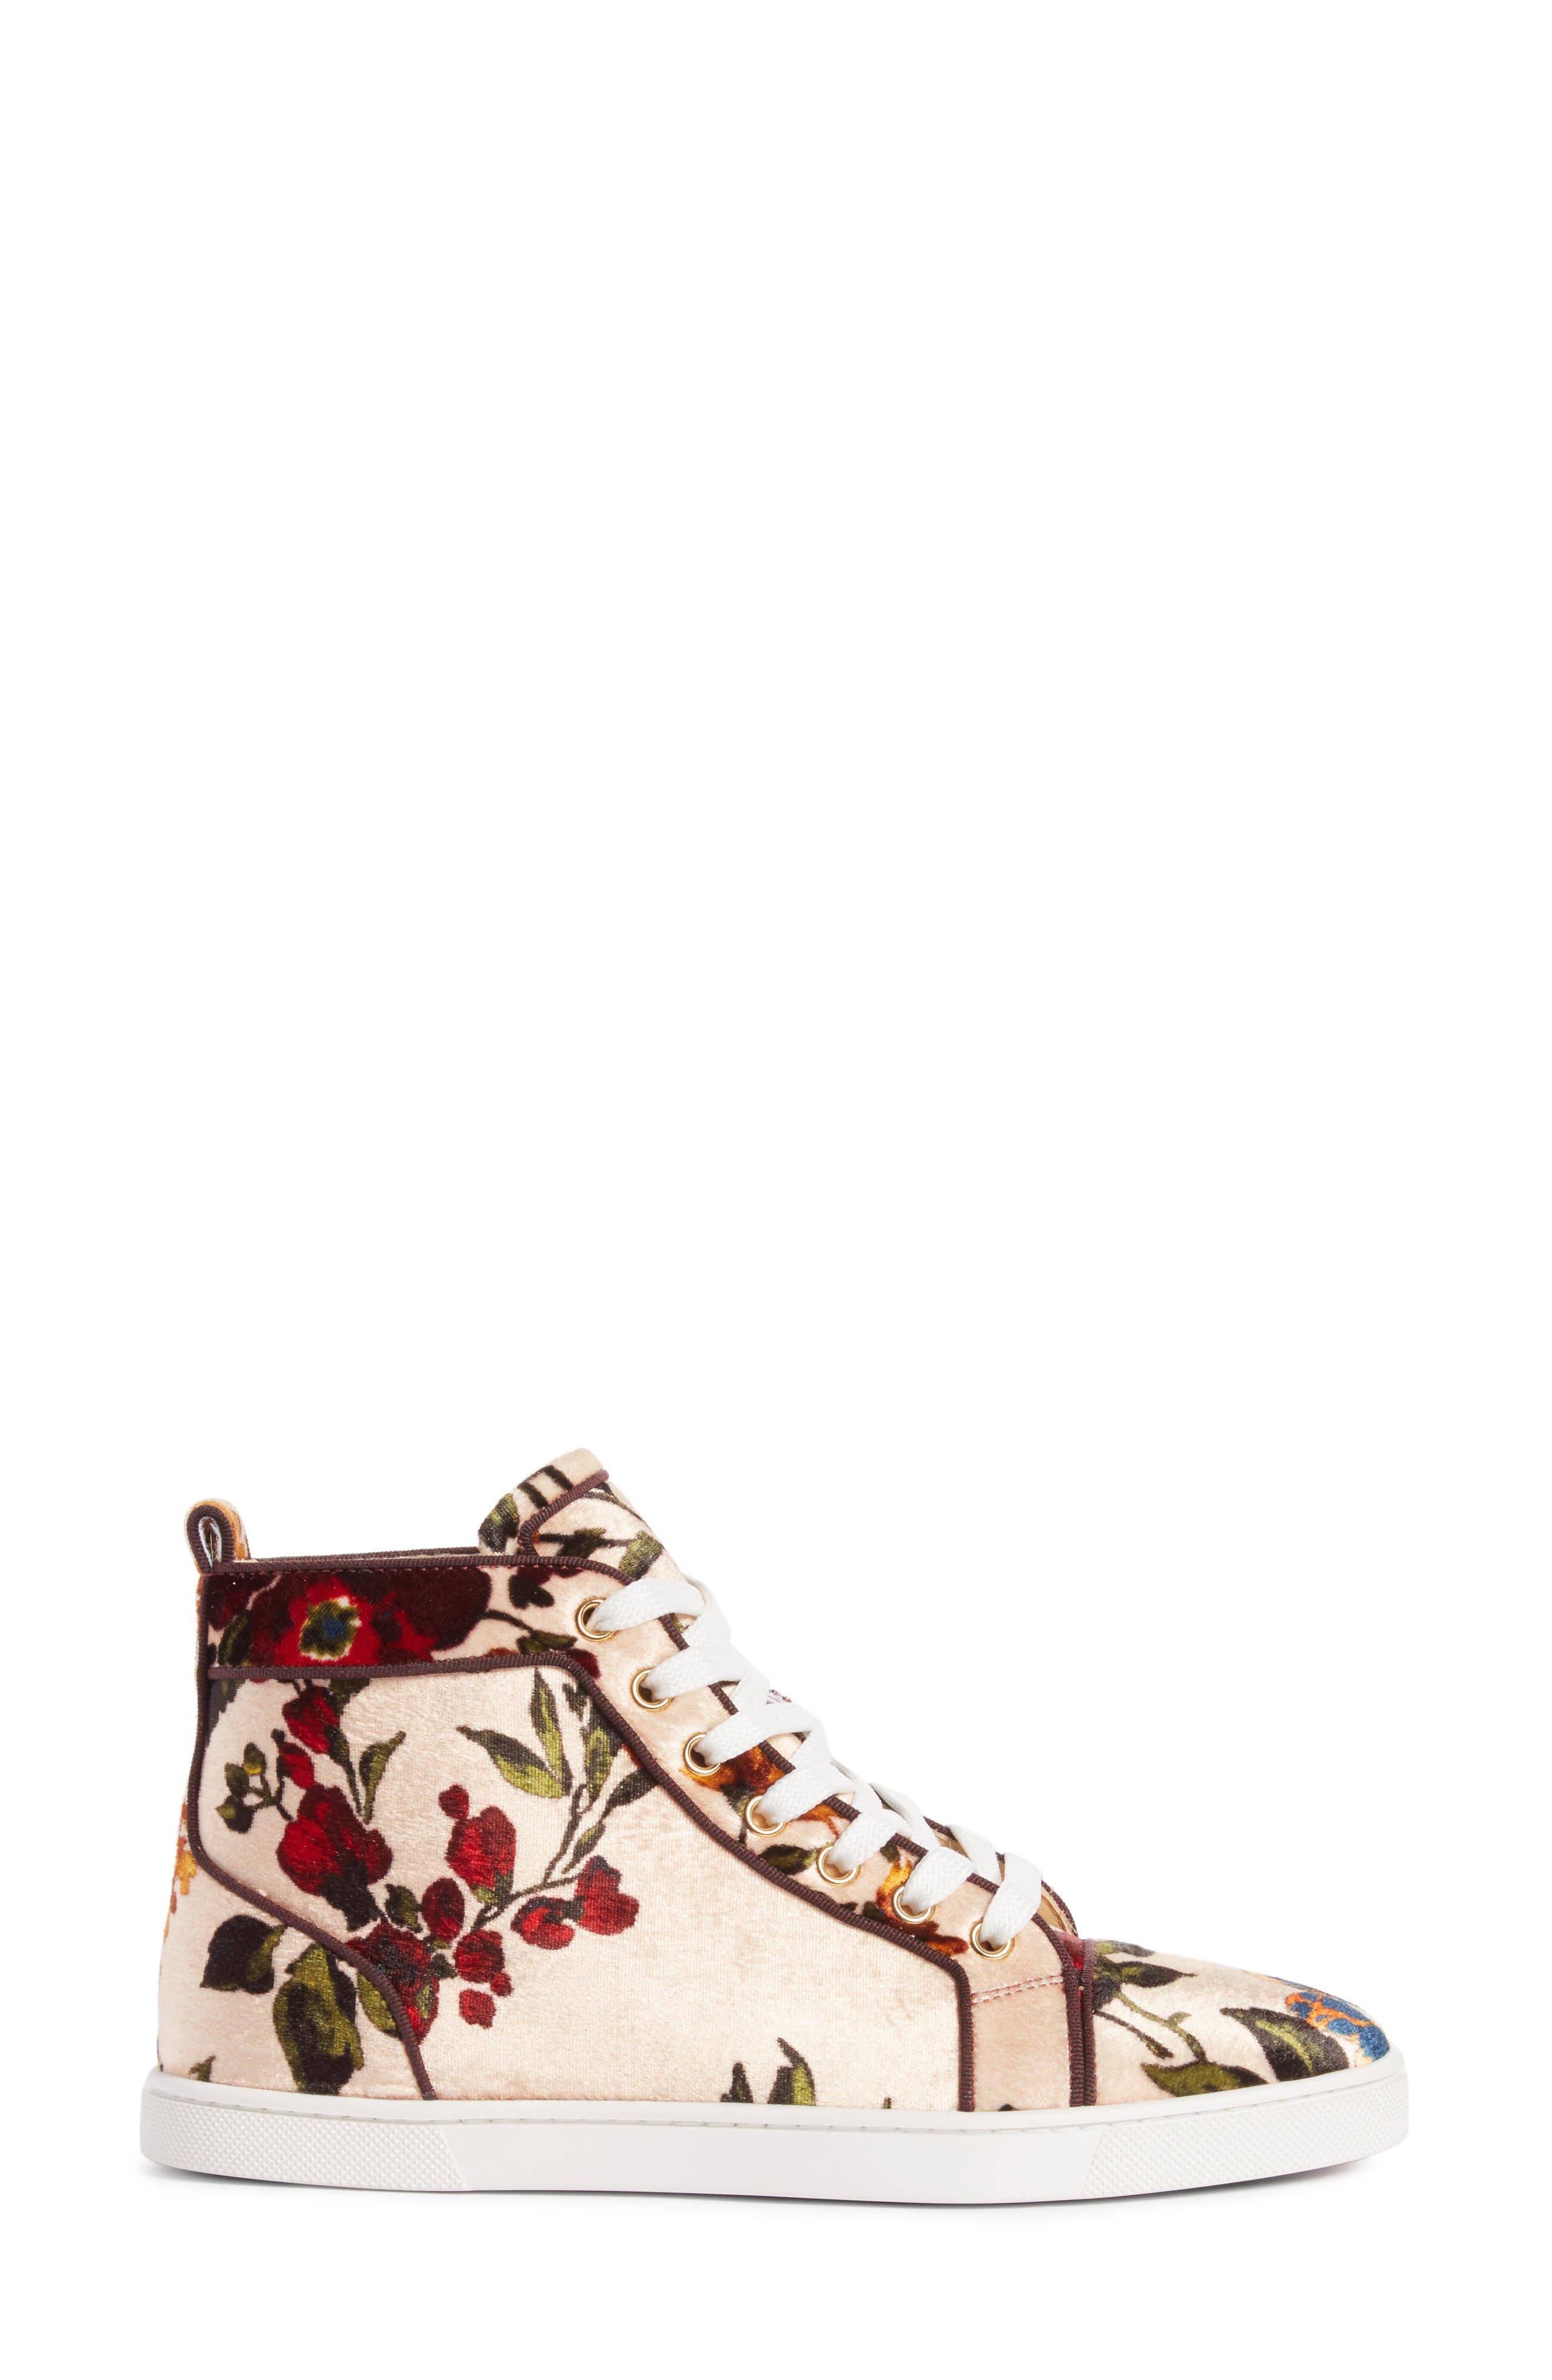 CHRISTIAN LOUBOUTIN,                             Bip Bip Floral Sneaker,                             Alternate thumbnail 3, color,                             250